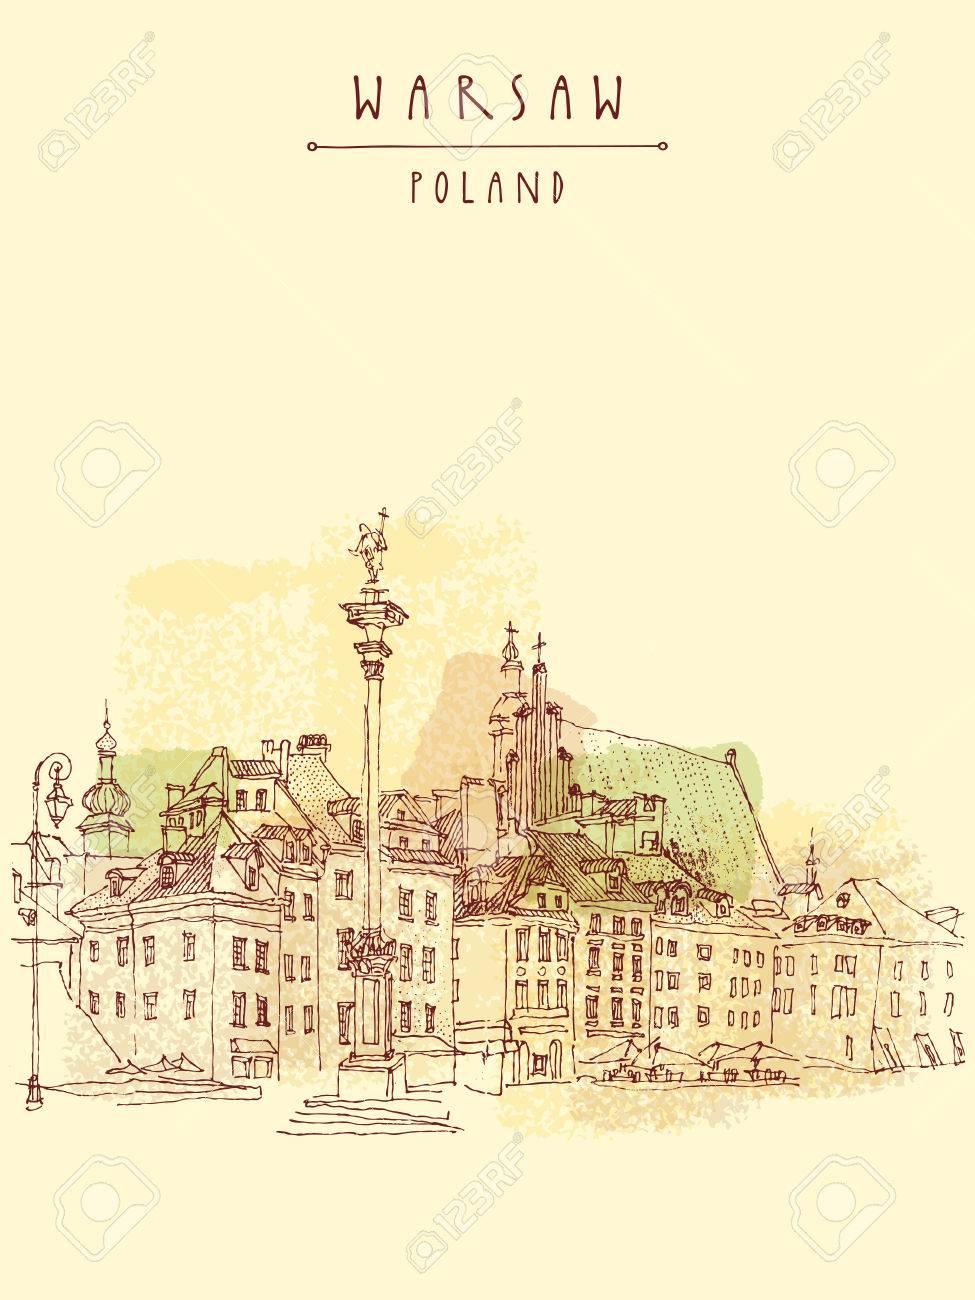 Castle Square in old center of Warsaw, Poland. Historic buildings. Travel sketch, hand lettering. Artistic vintage postcard template, vector illustration - 47488248